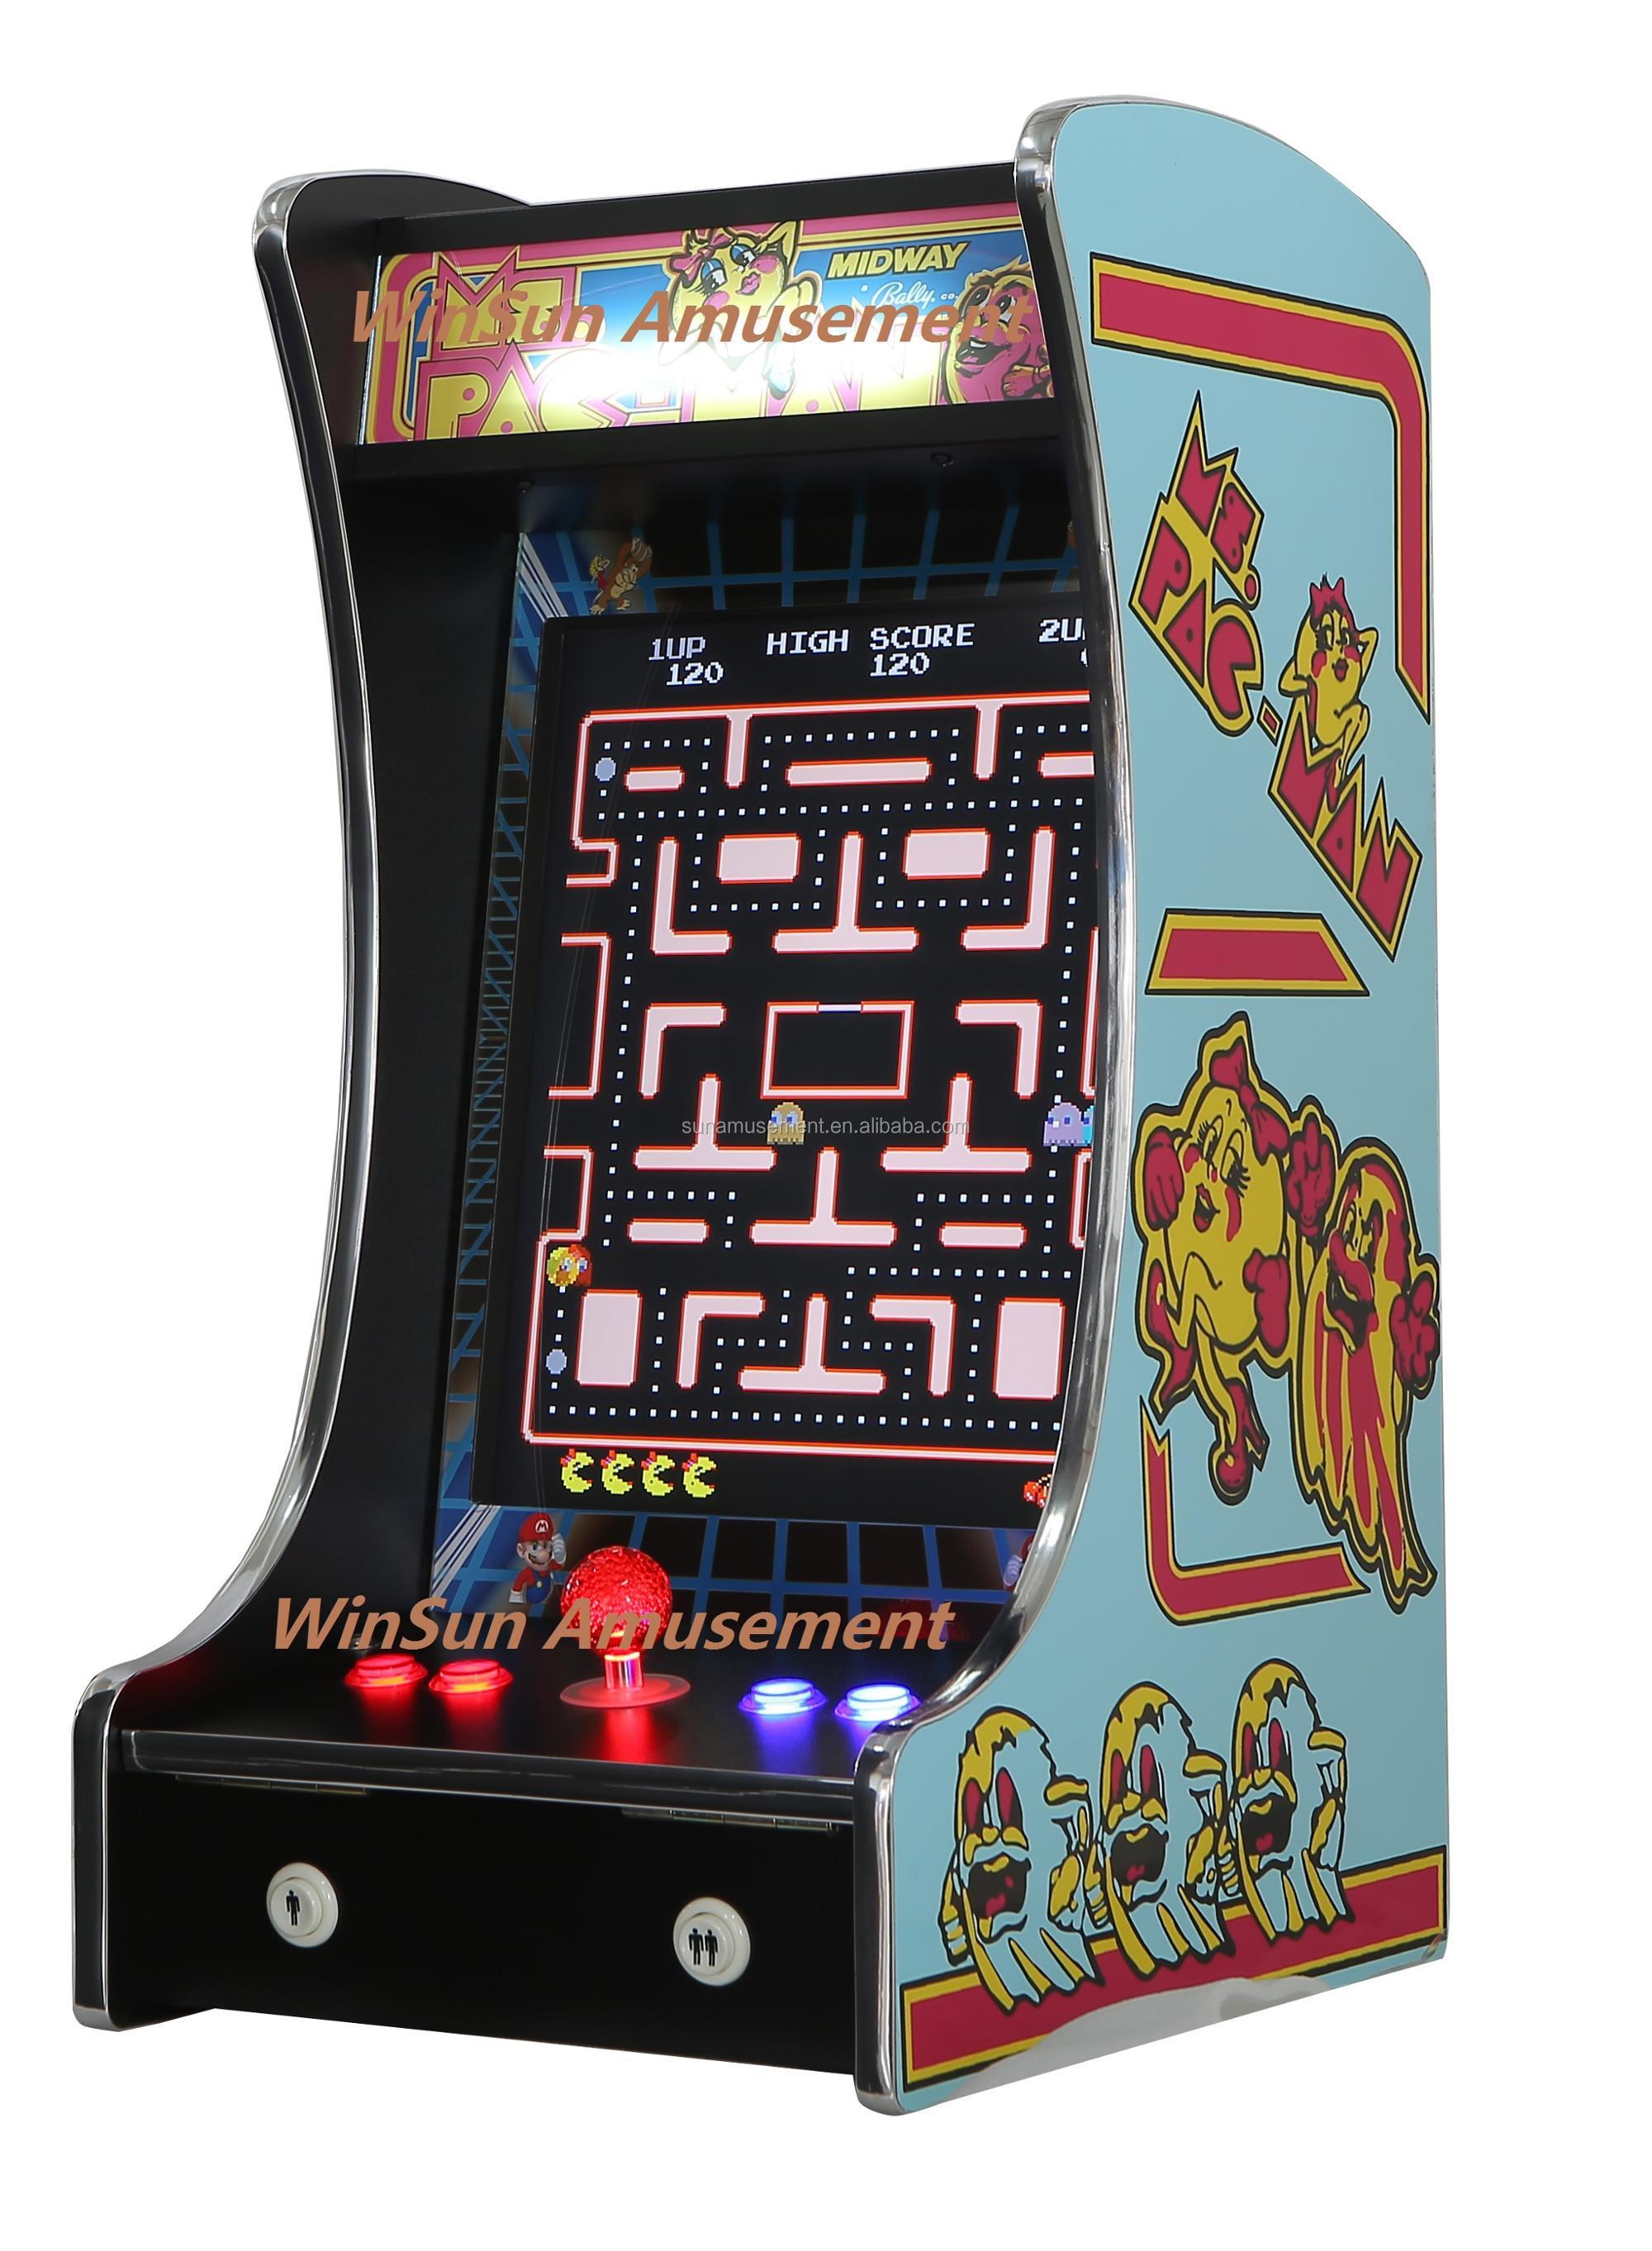 Pac Man Machine >> Wholesales 60 Games Pac Man Mini Arcade Game Machine Buy Mini Arcade Machine Mini Arcade Games Arcade Game Machine Product On Alibaba Com